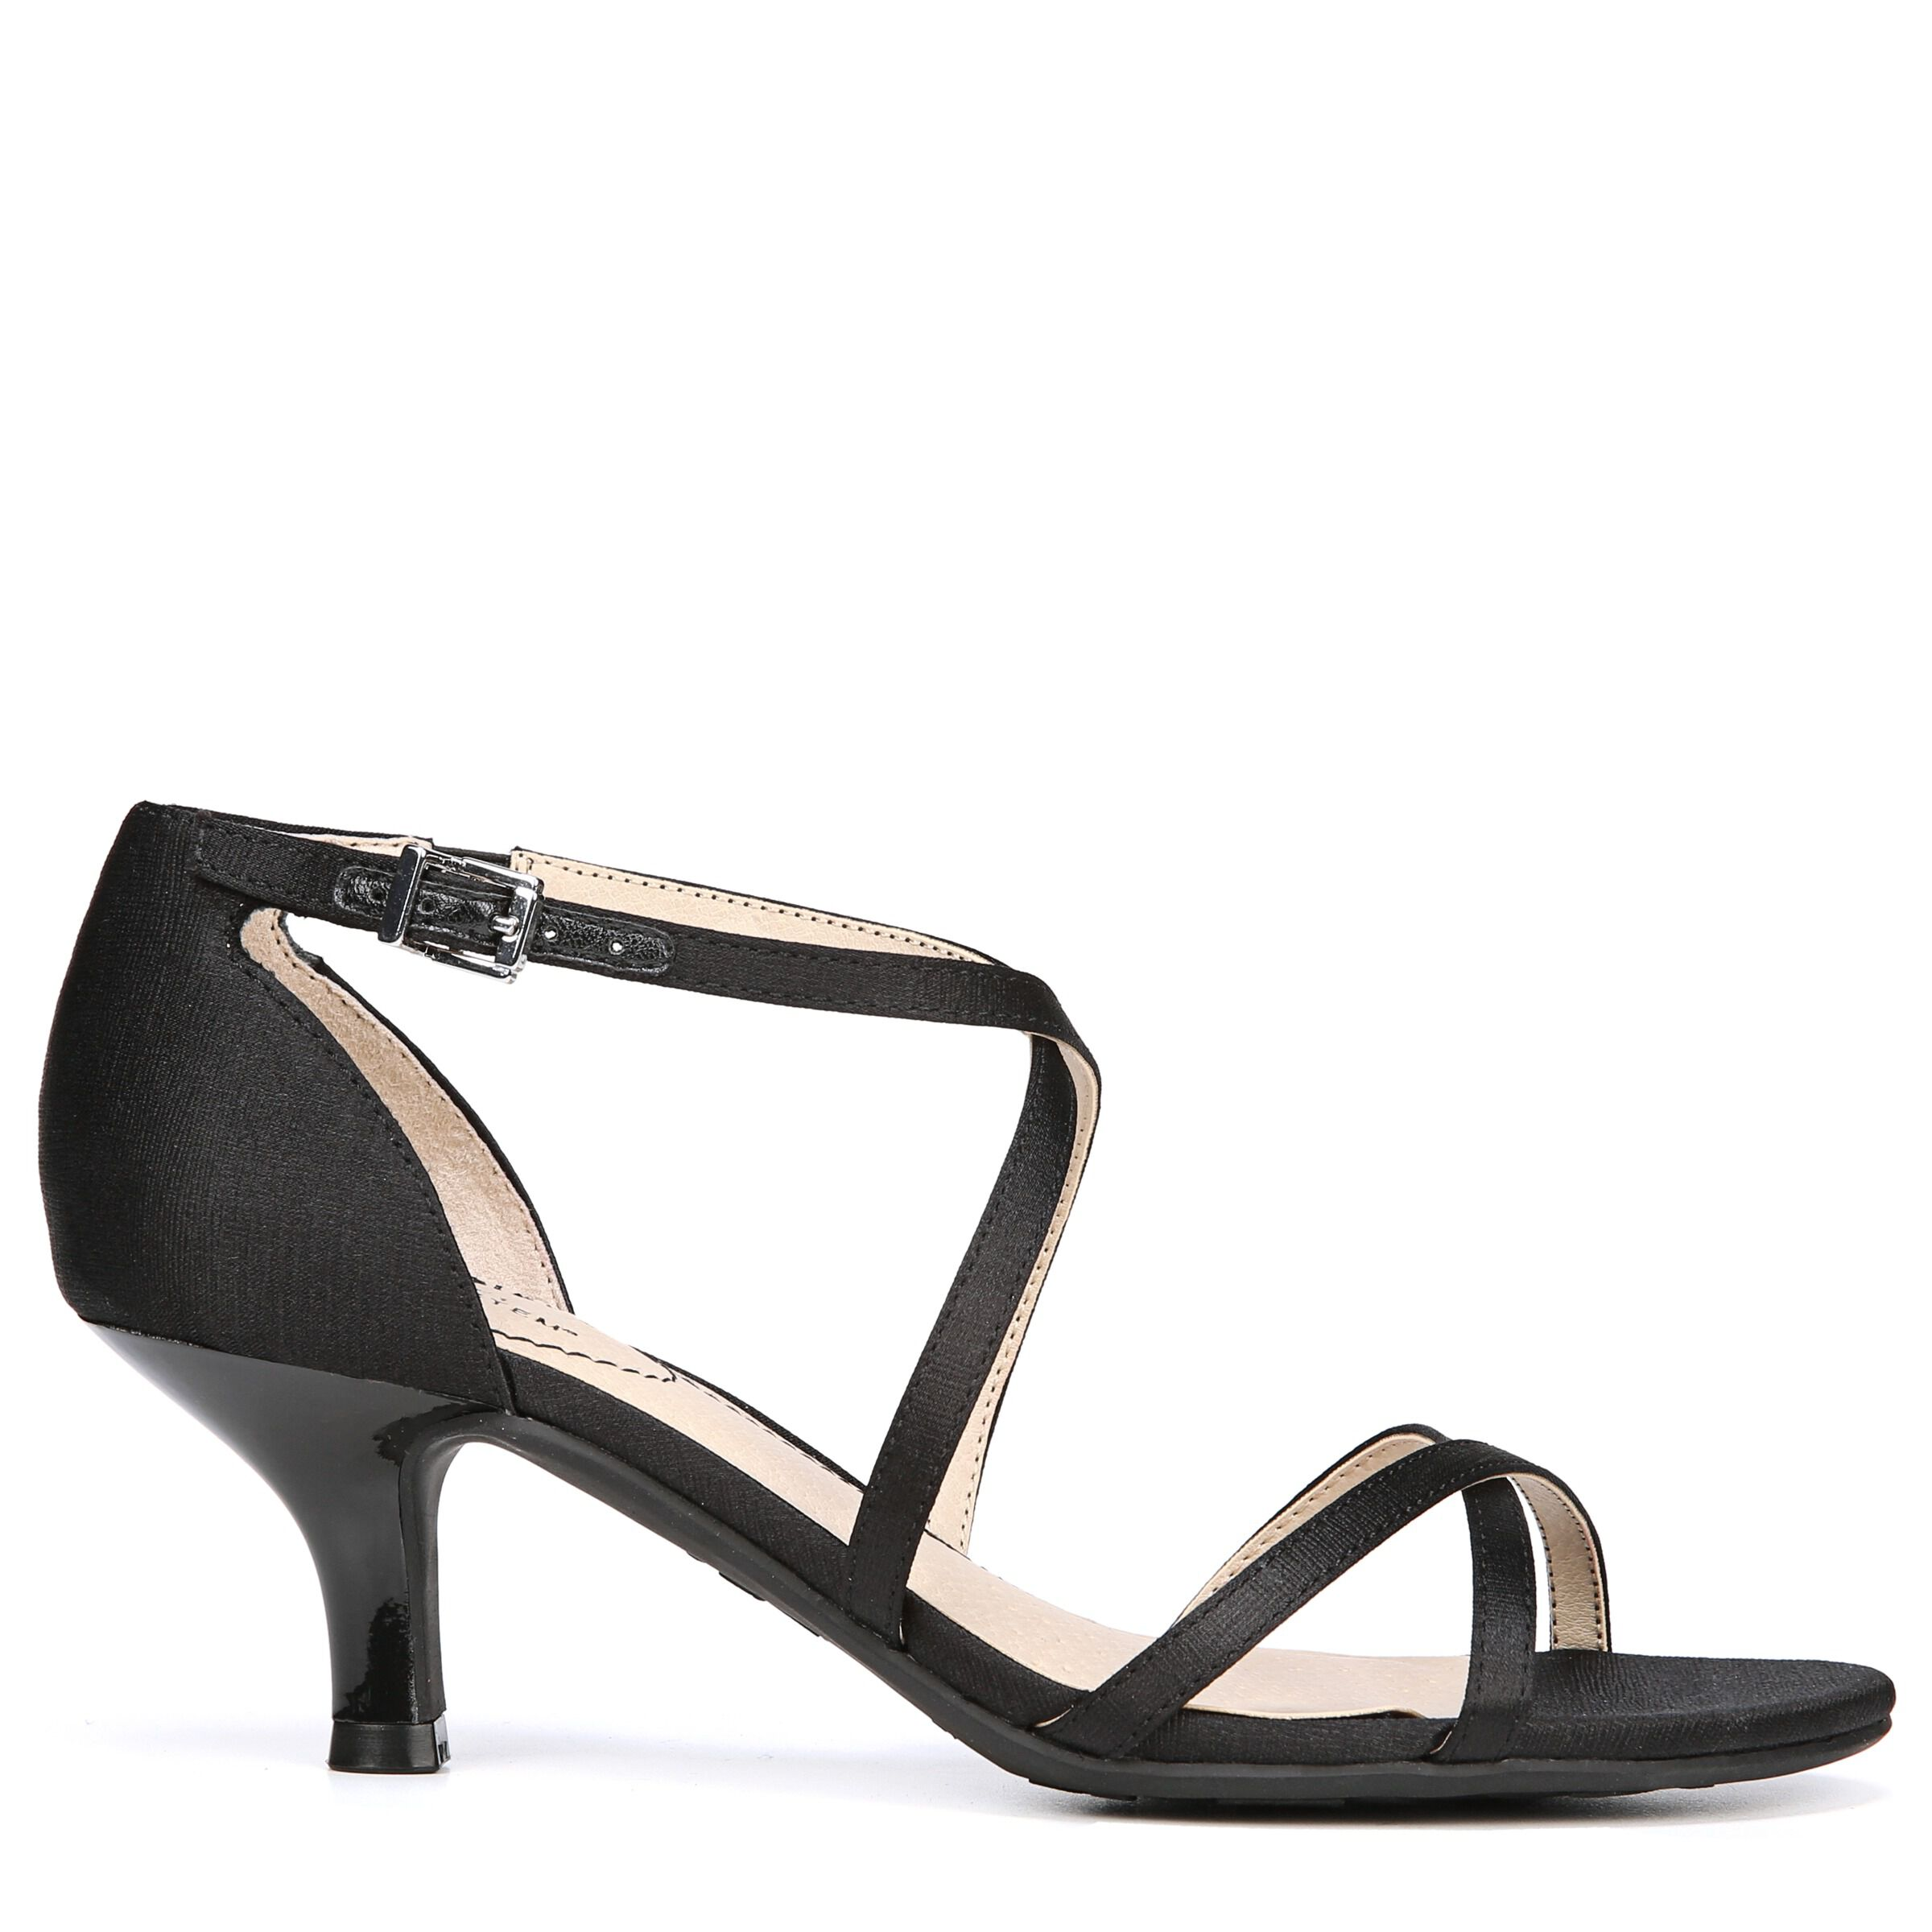 Women's LifeStride Flaunt Strappy Heeled Dress Sandals Blk Texture Sat